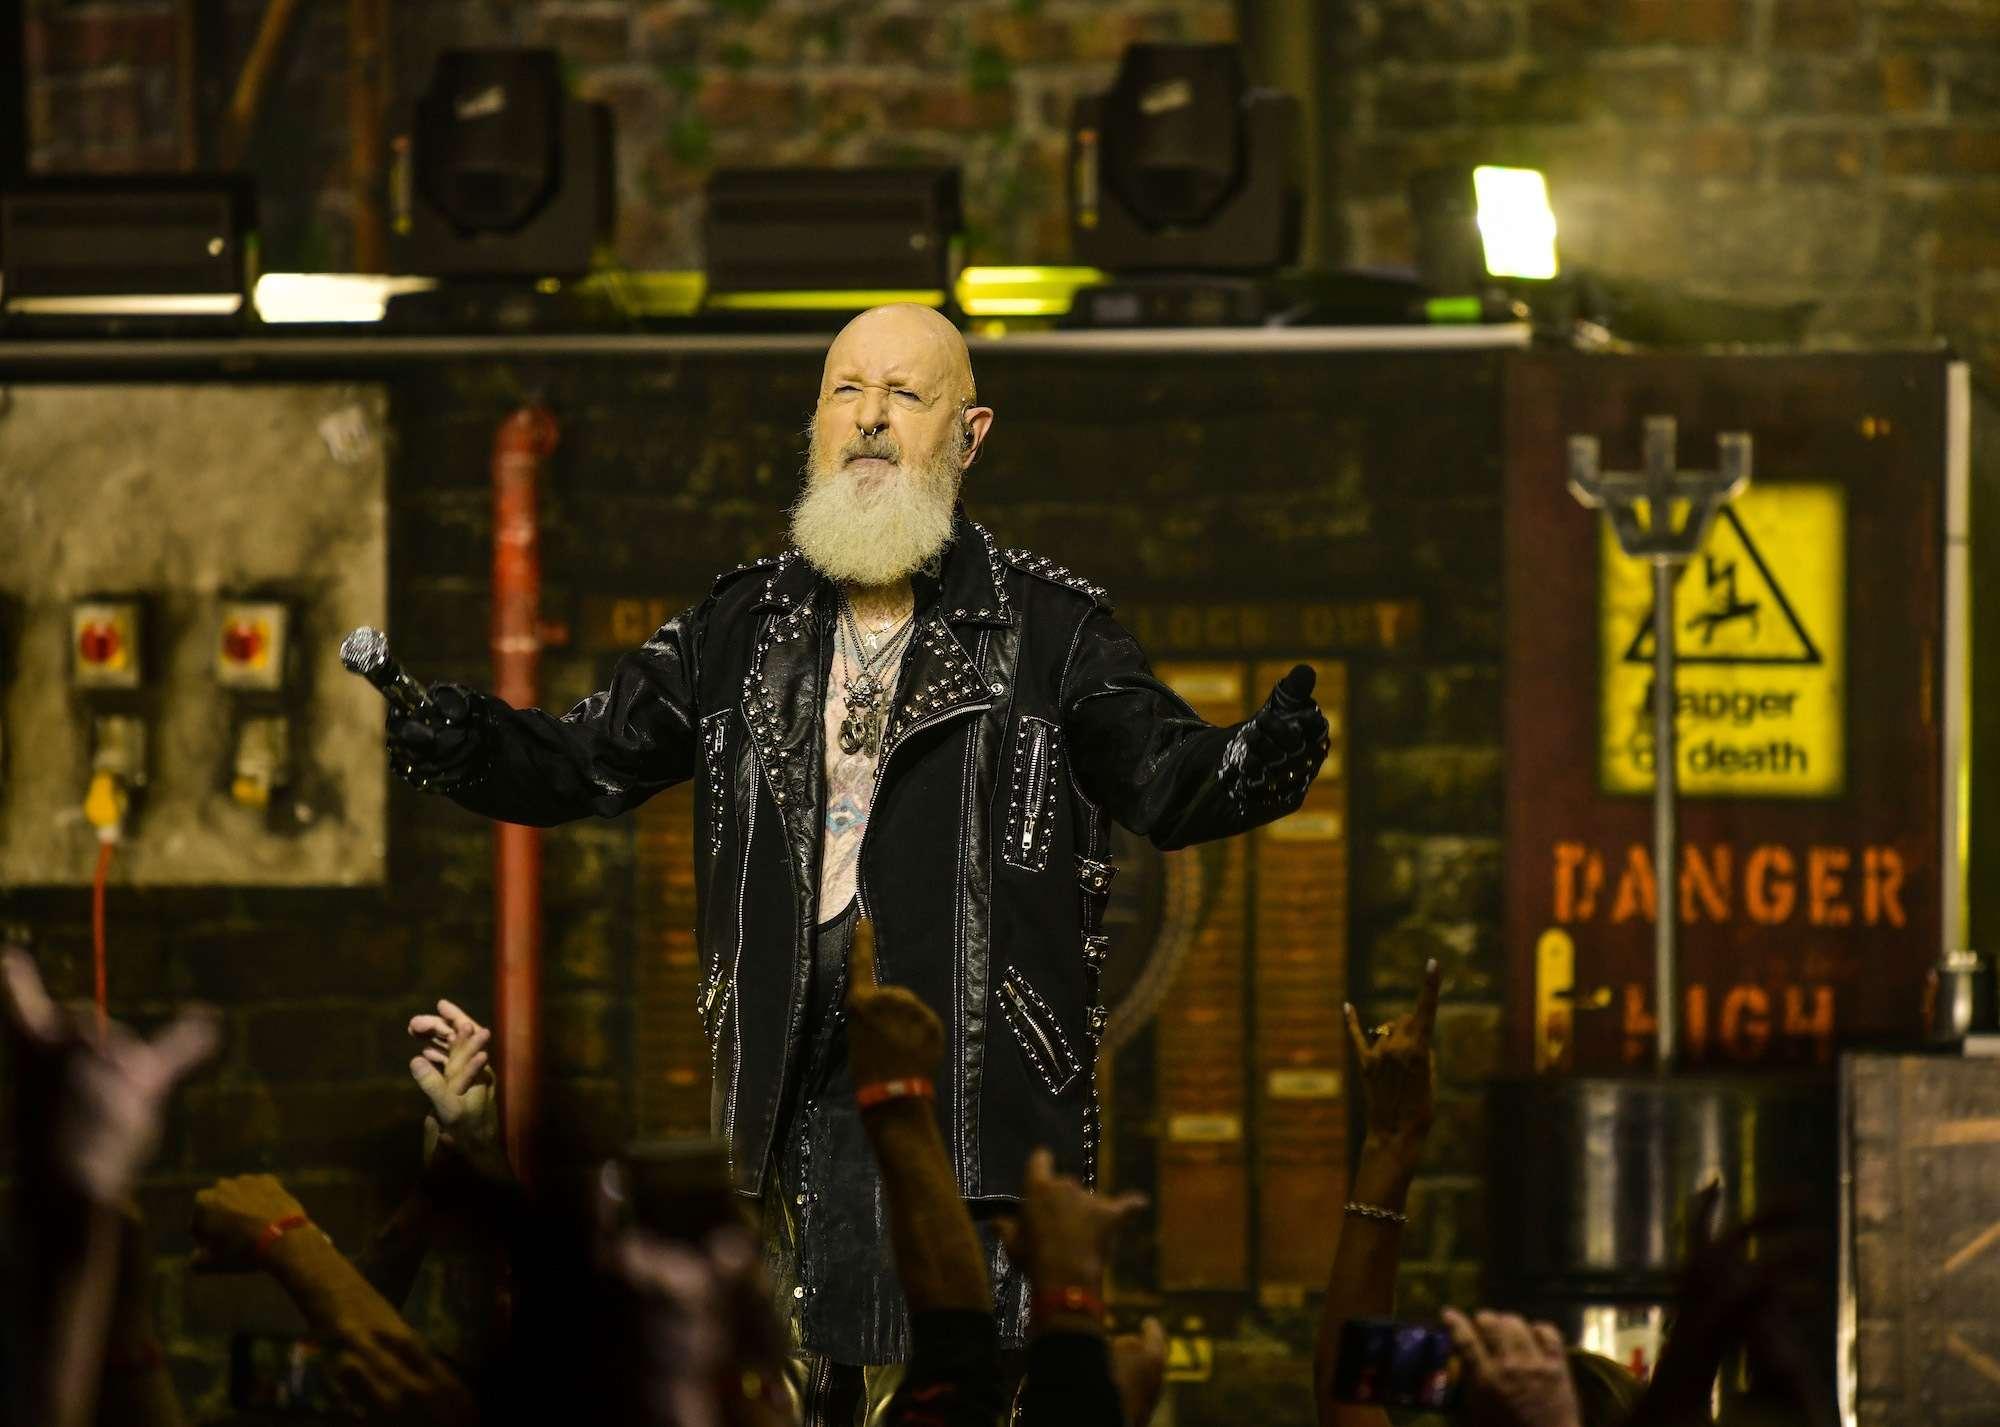 Judas Priest Live at Rosemont Theatre [GALLERY] 6